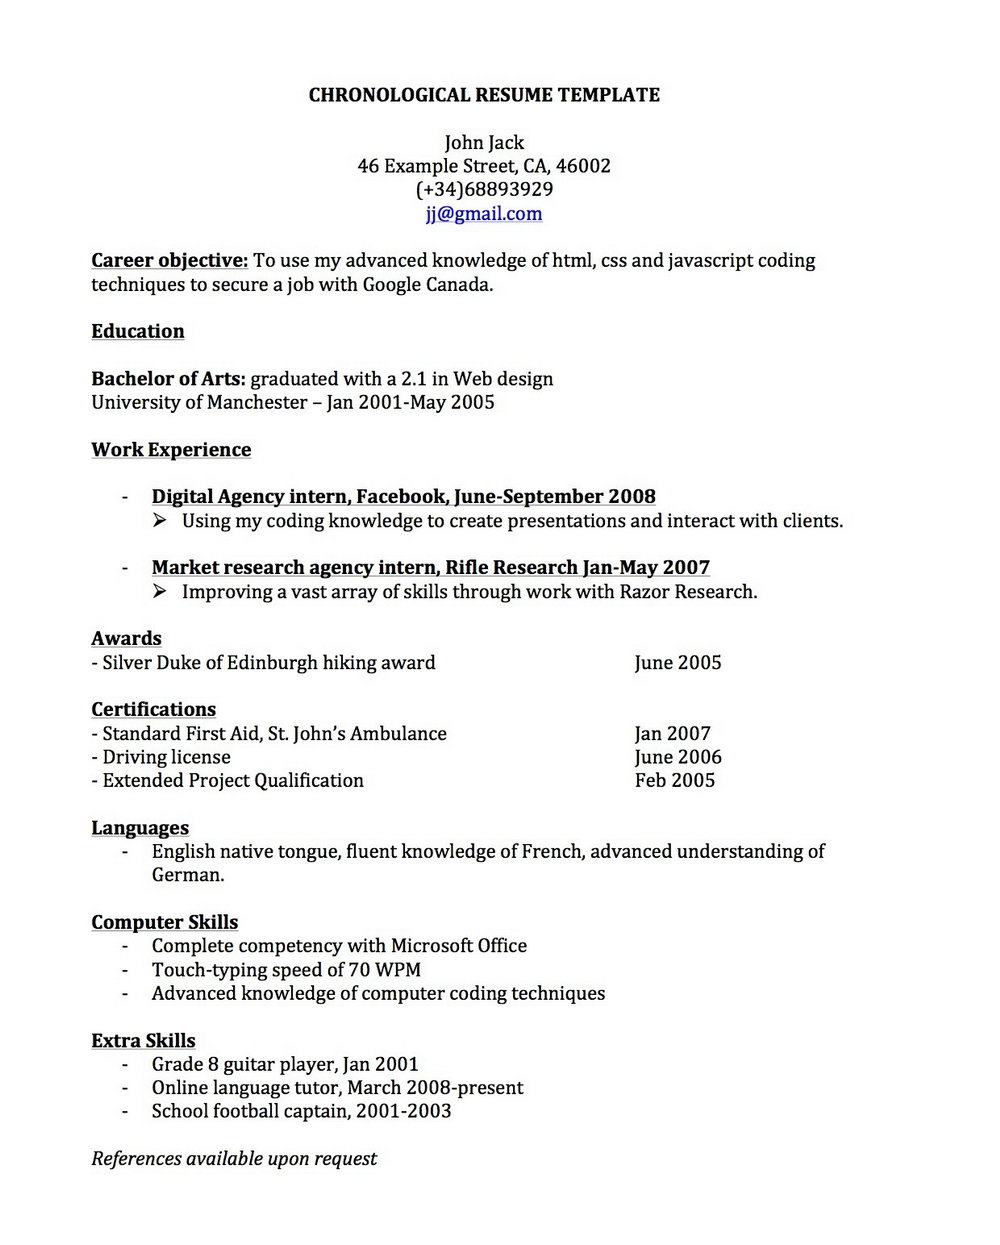 Free Chronological Resume Template Microsoft Word